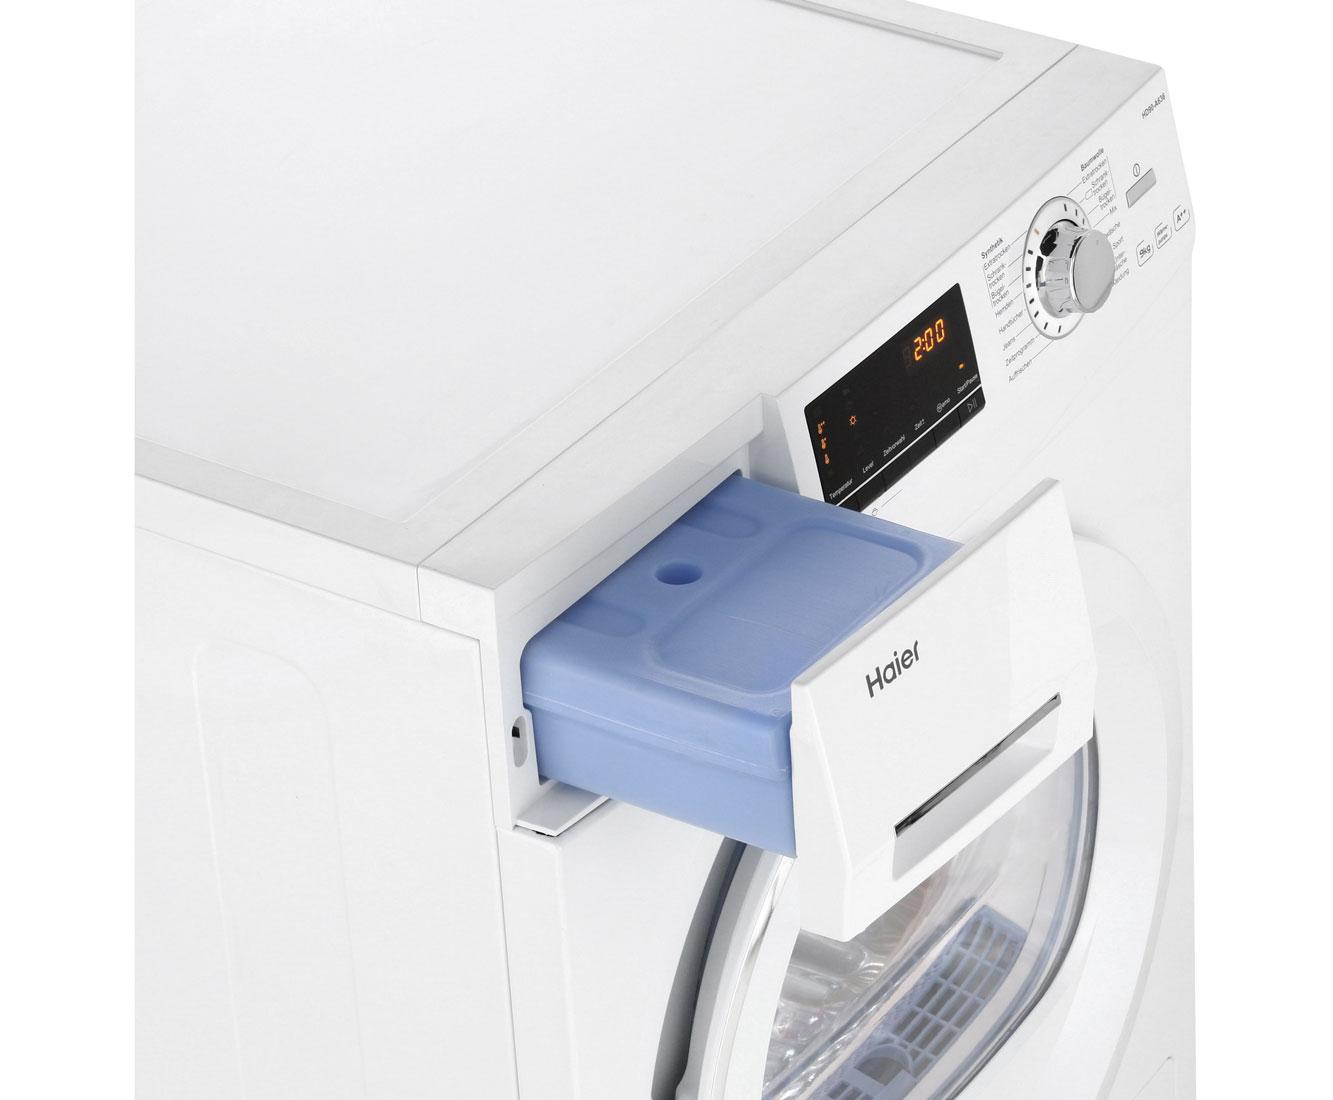 Haier hd90 a636 wärmepumpentrockner freistehend weiss neu ebay